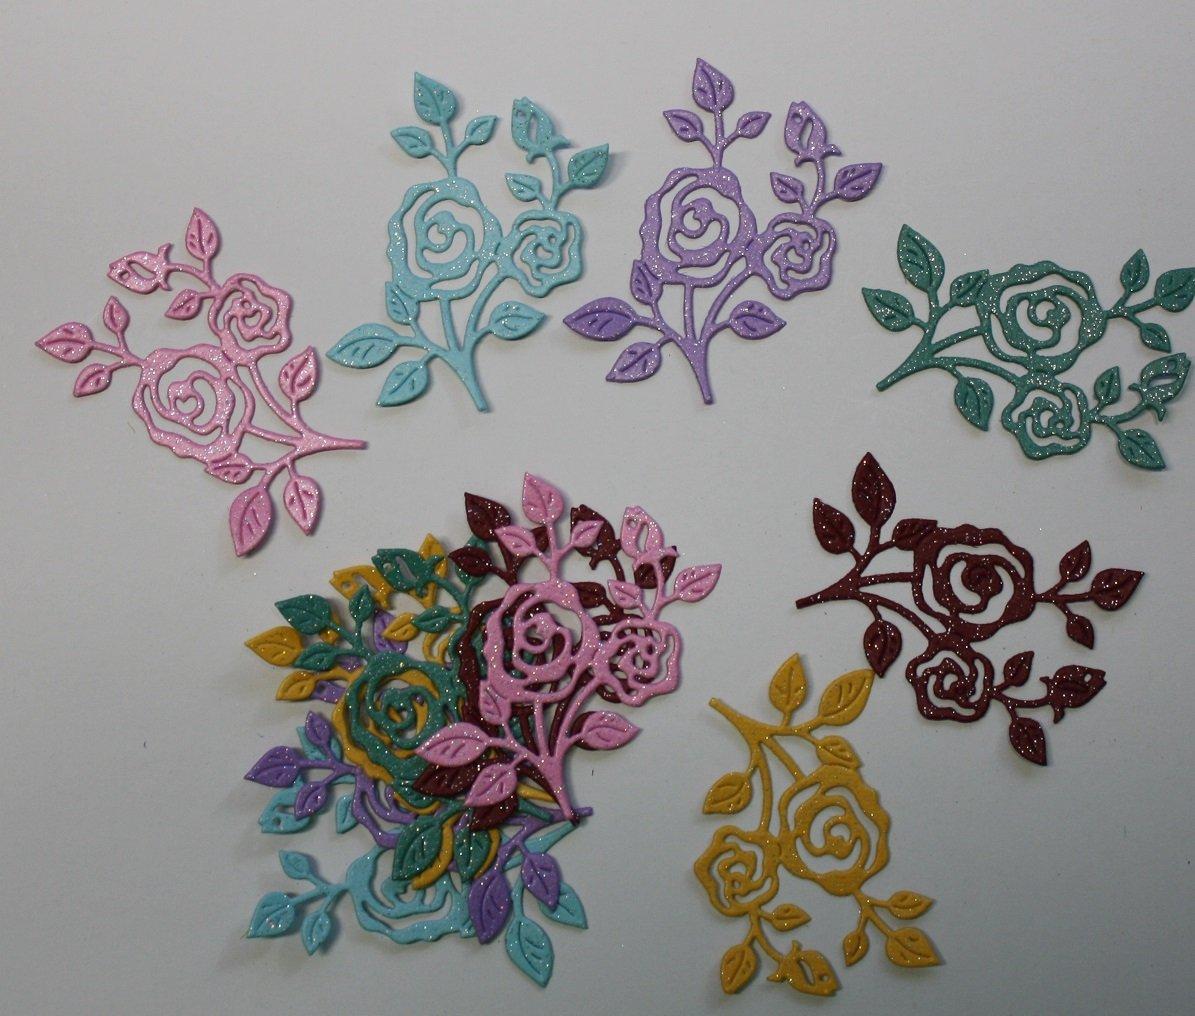 12 Glitter Flowering Vines/Die Cuts/Scrapbooking/flowers/Paper Cuts/Embellishments/Cottage Cutz